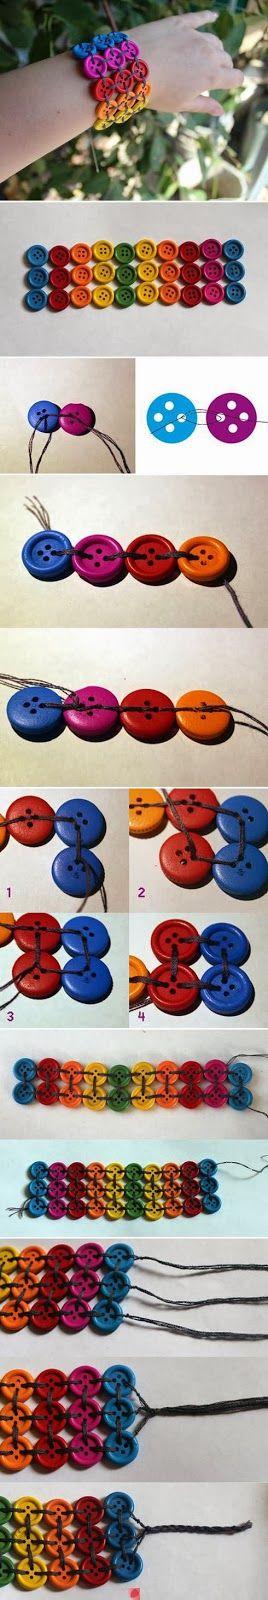 Easy DIY Crafts: DIY Bracelet easy jewelry craft idea.